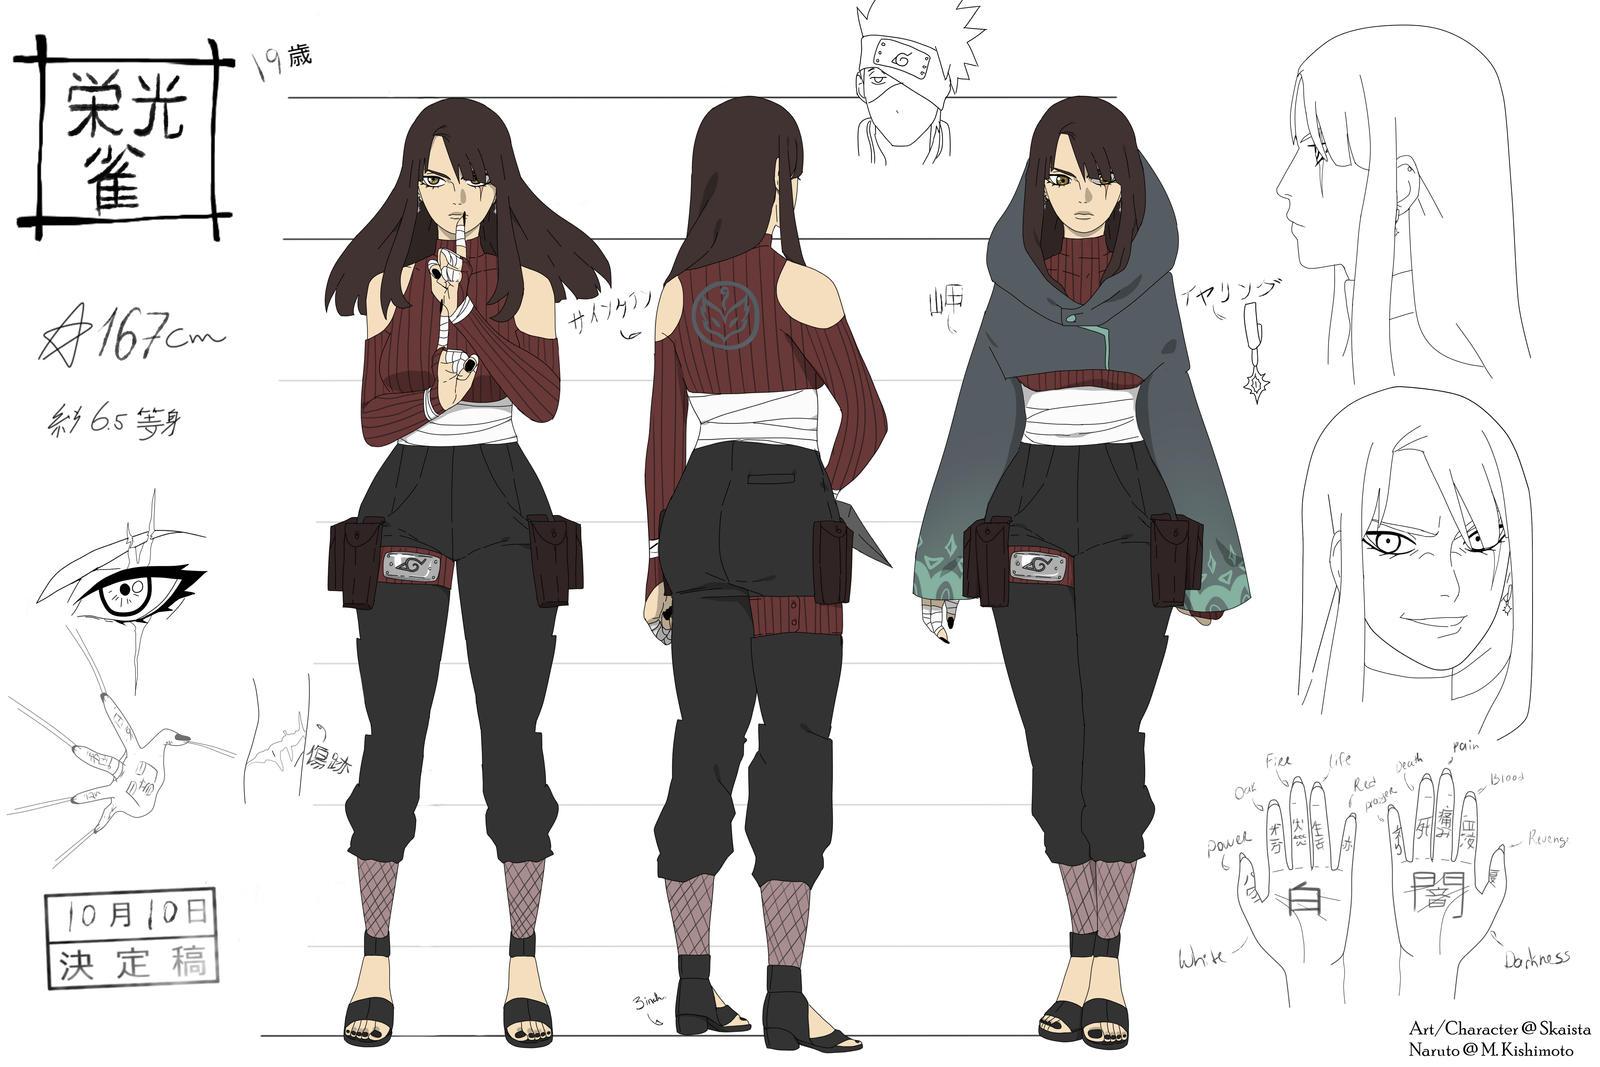 Naruto Oc Eiko Suzume By Shisaireru On Deviantart